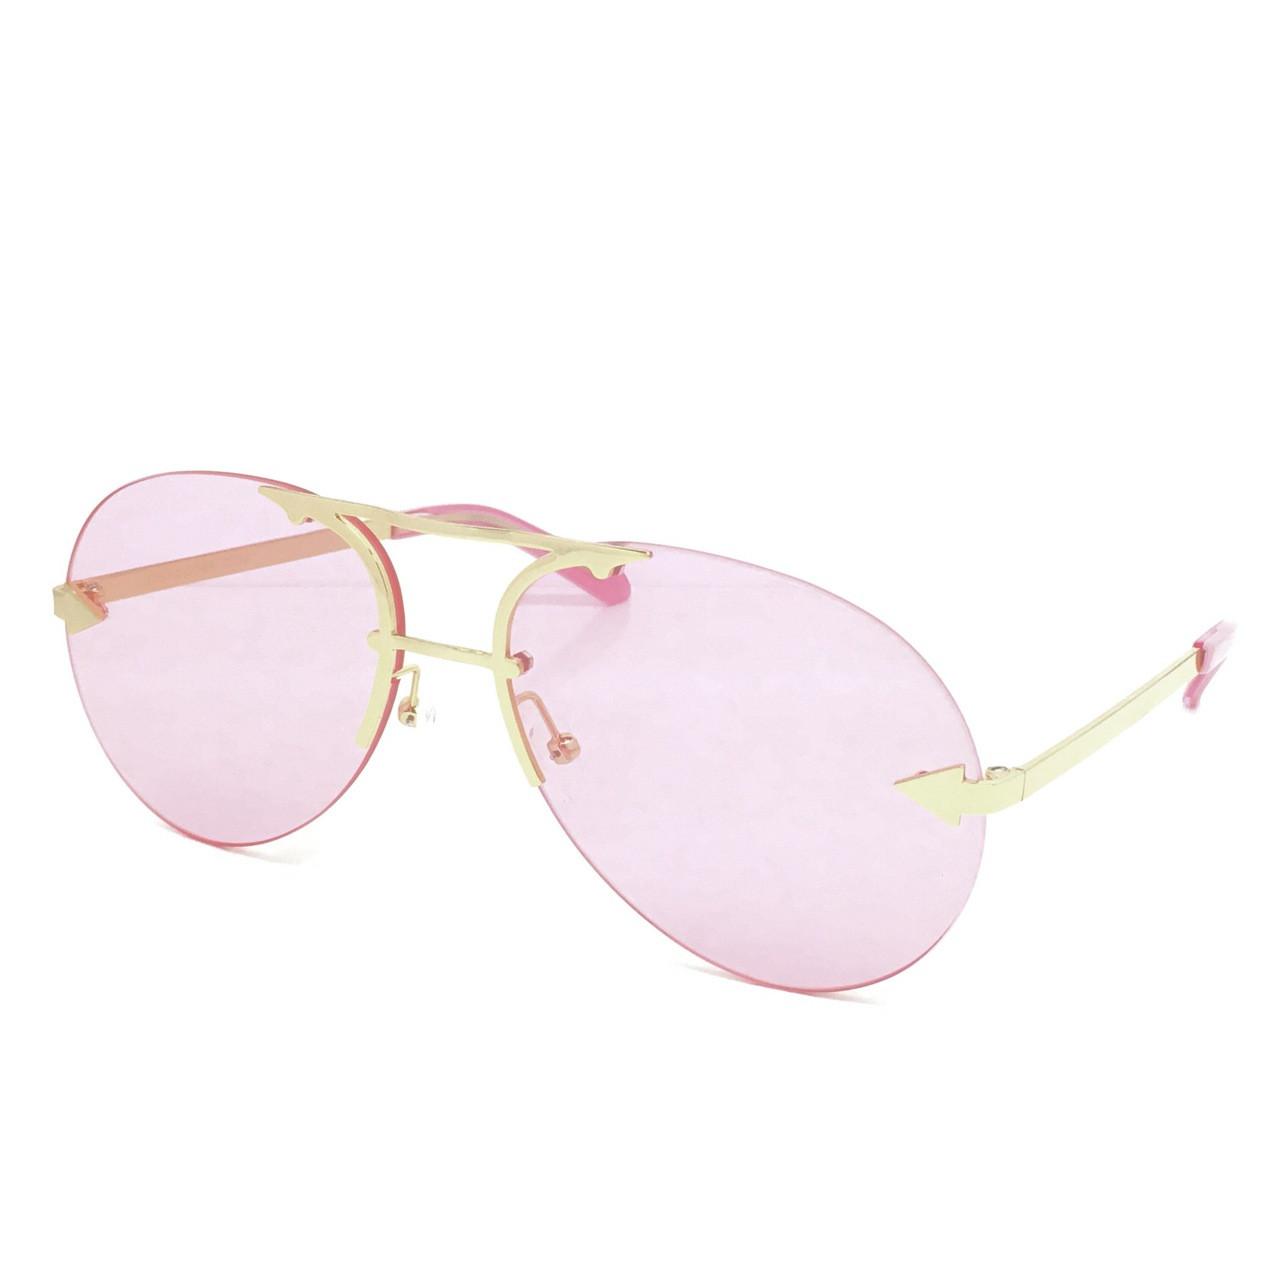 152152ac5fb Karen Walker Love hangover Pink